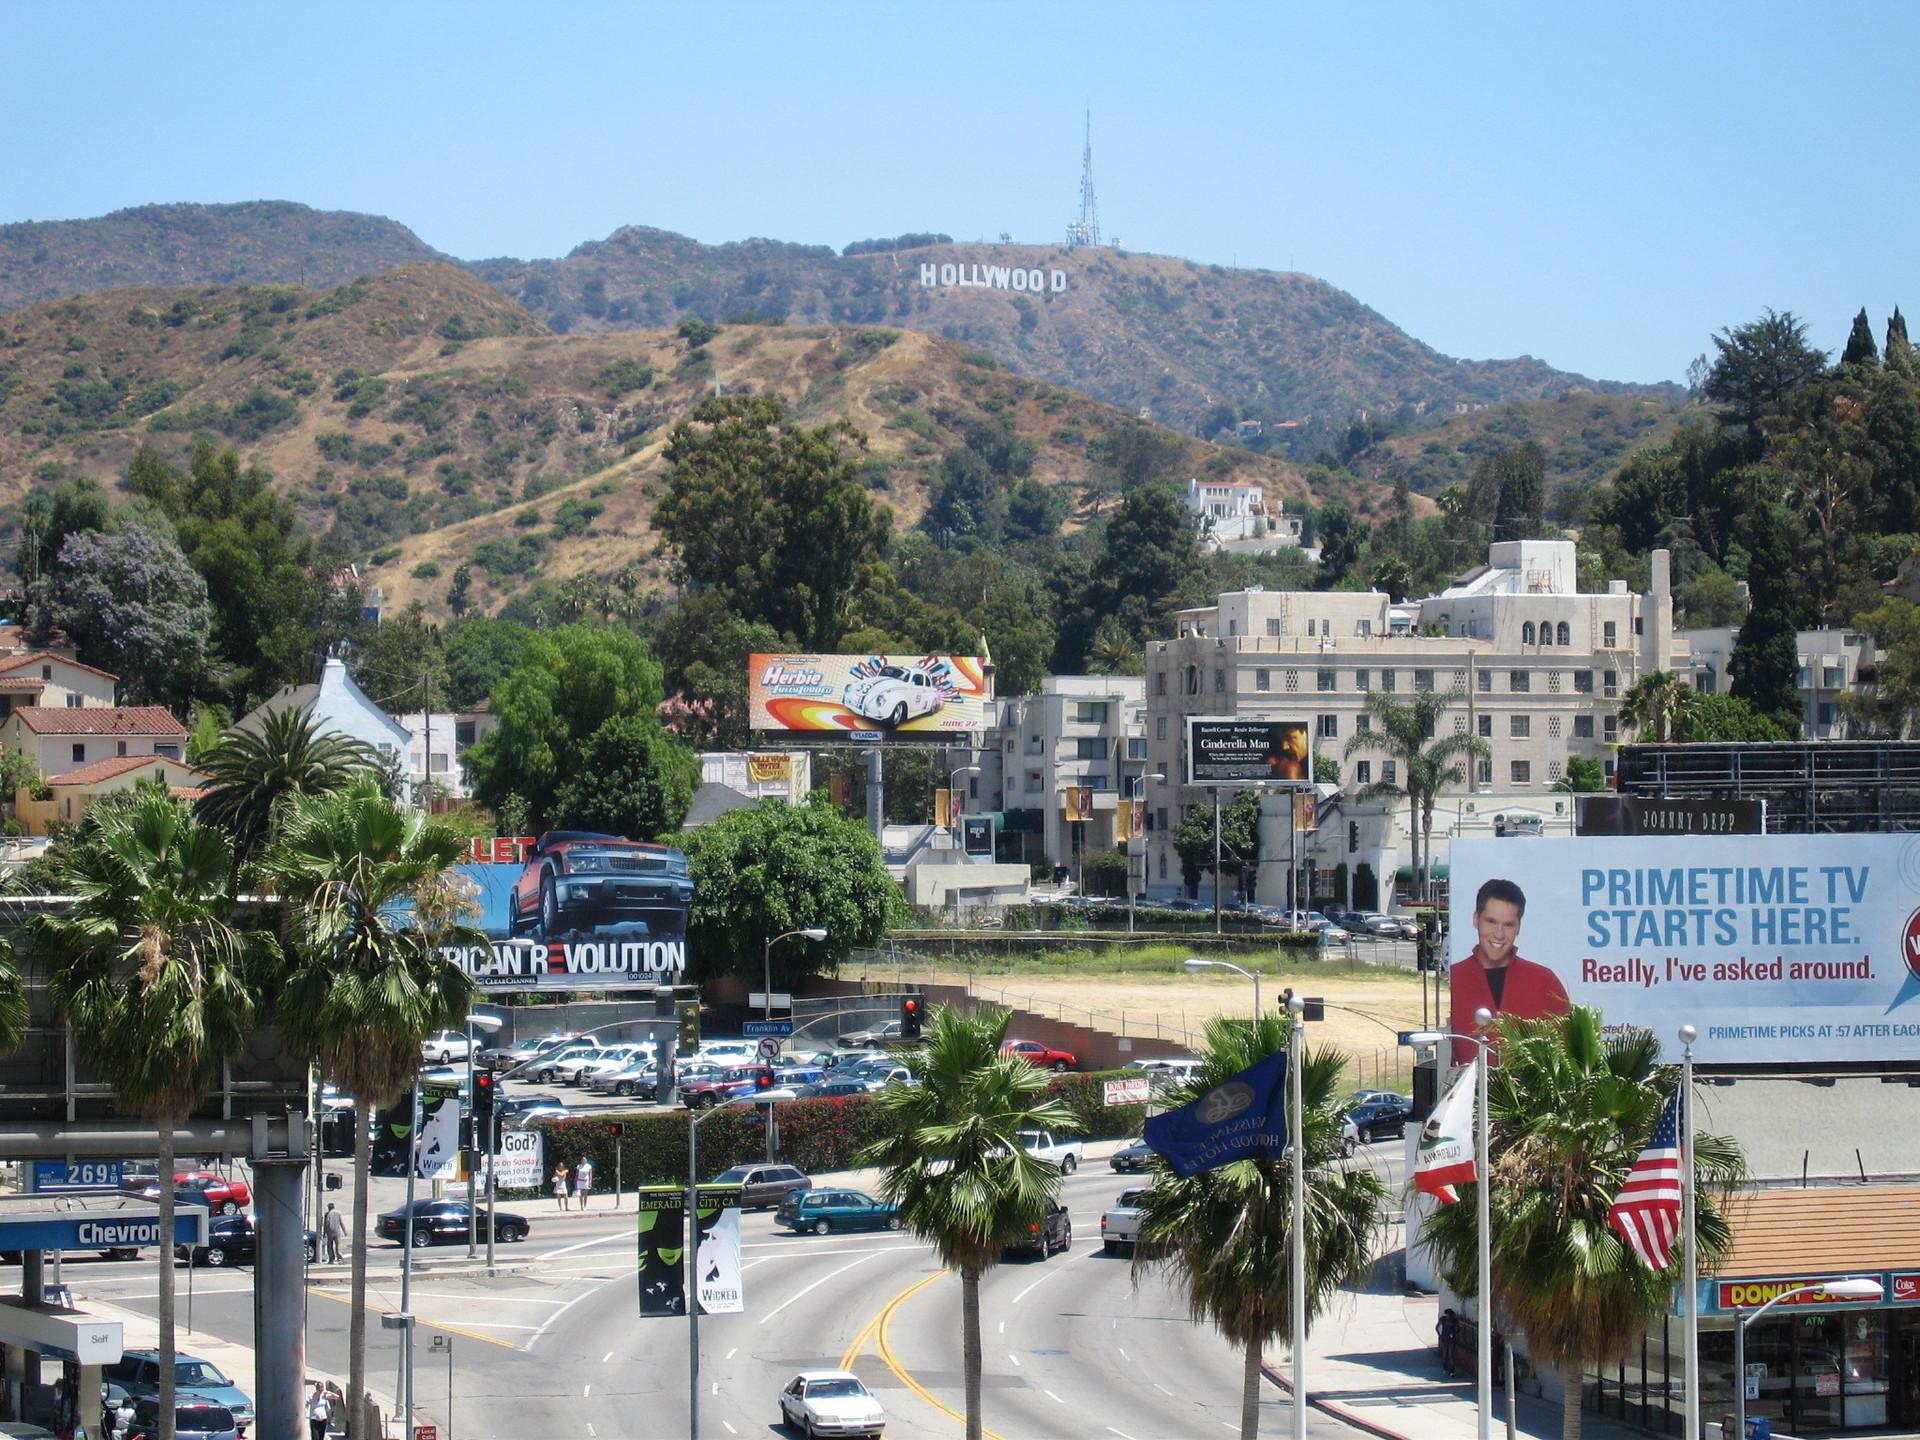 Hollywood   Los Angeles Wallpaper 1105950 1920x1440